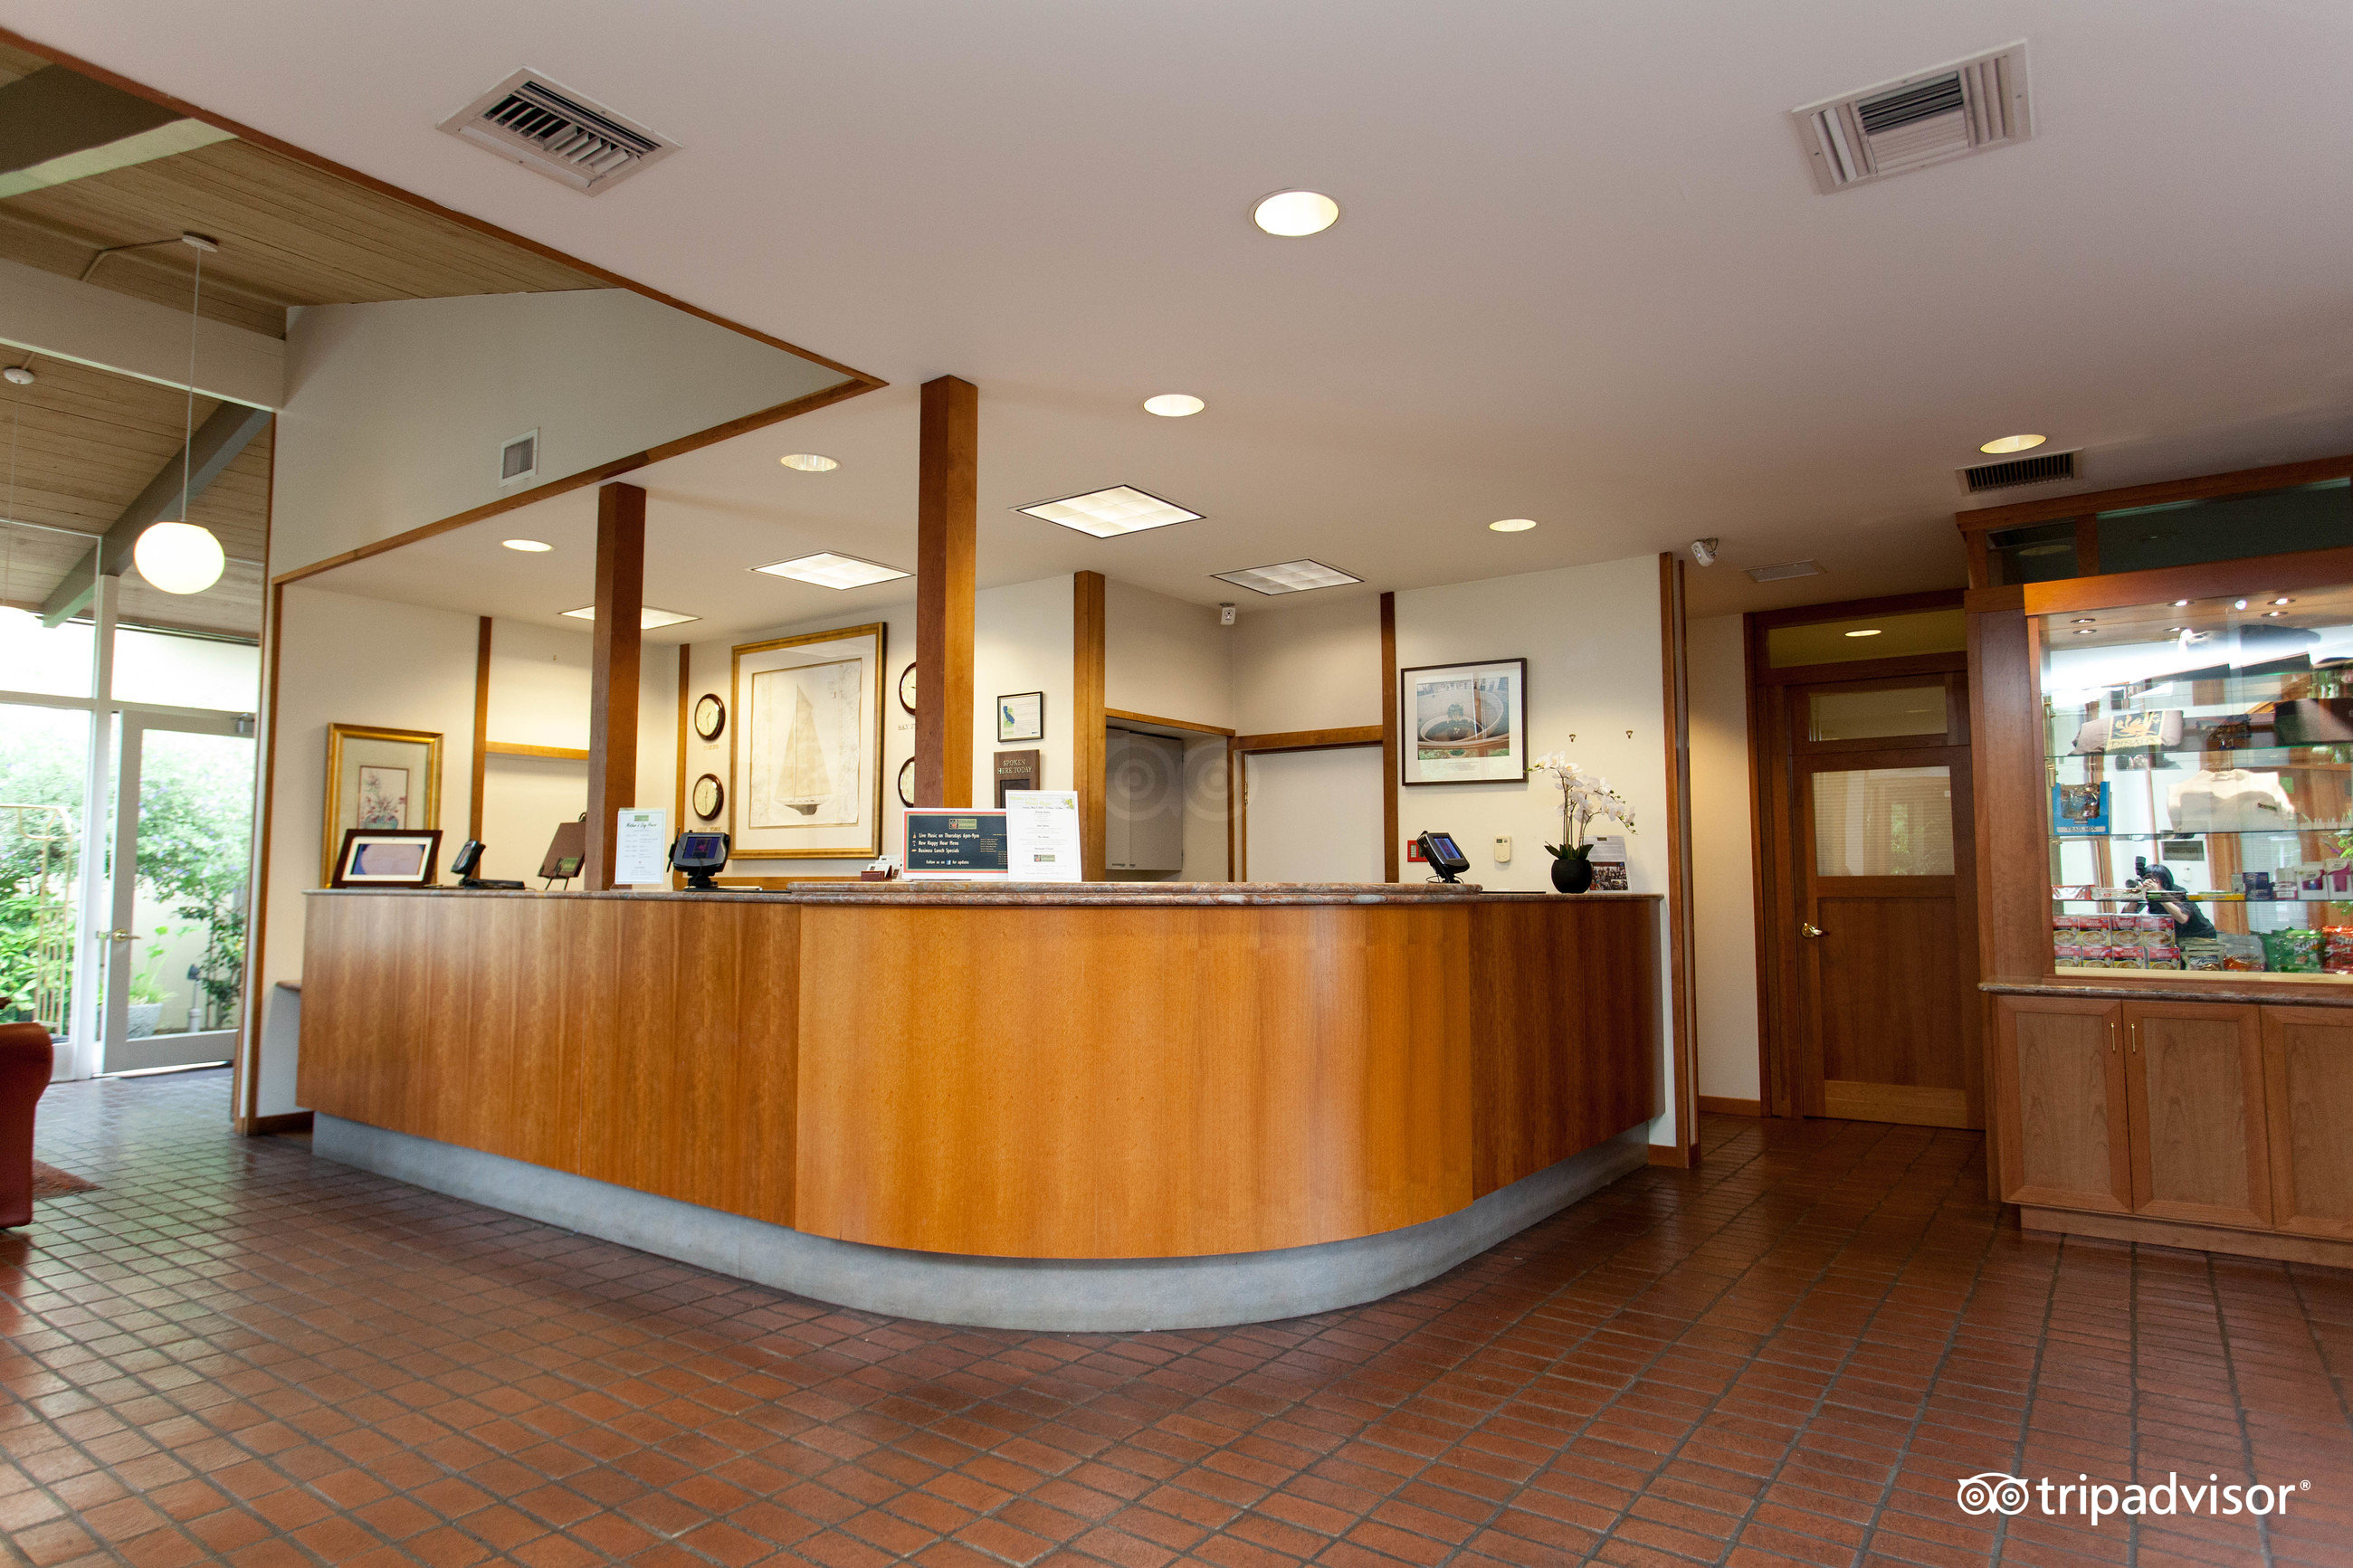 Dinahs Garden Hotel Palo Alto CA 2017 Review Family Vacation